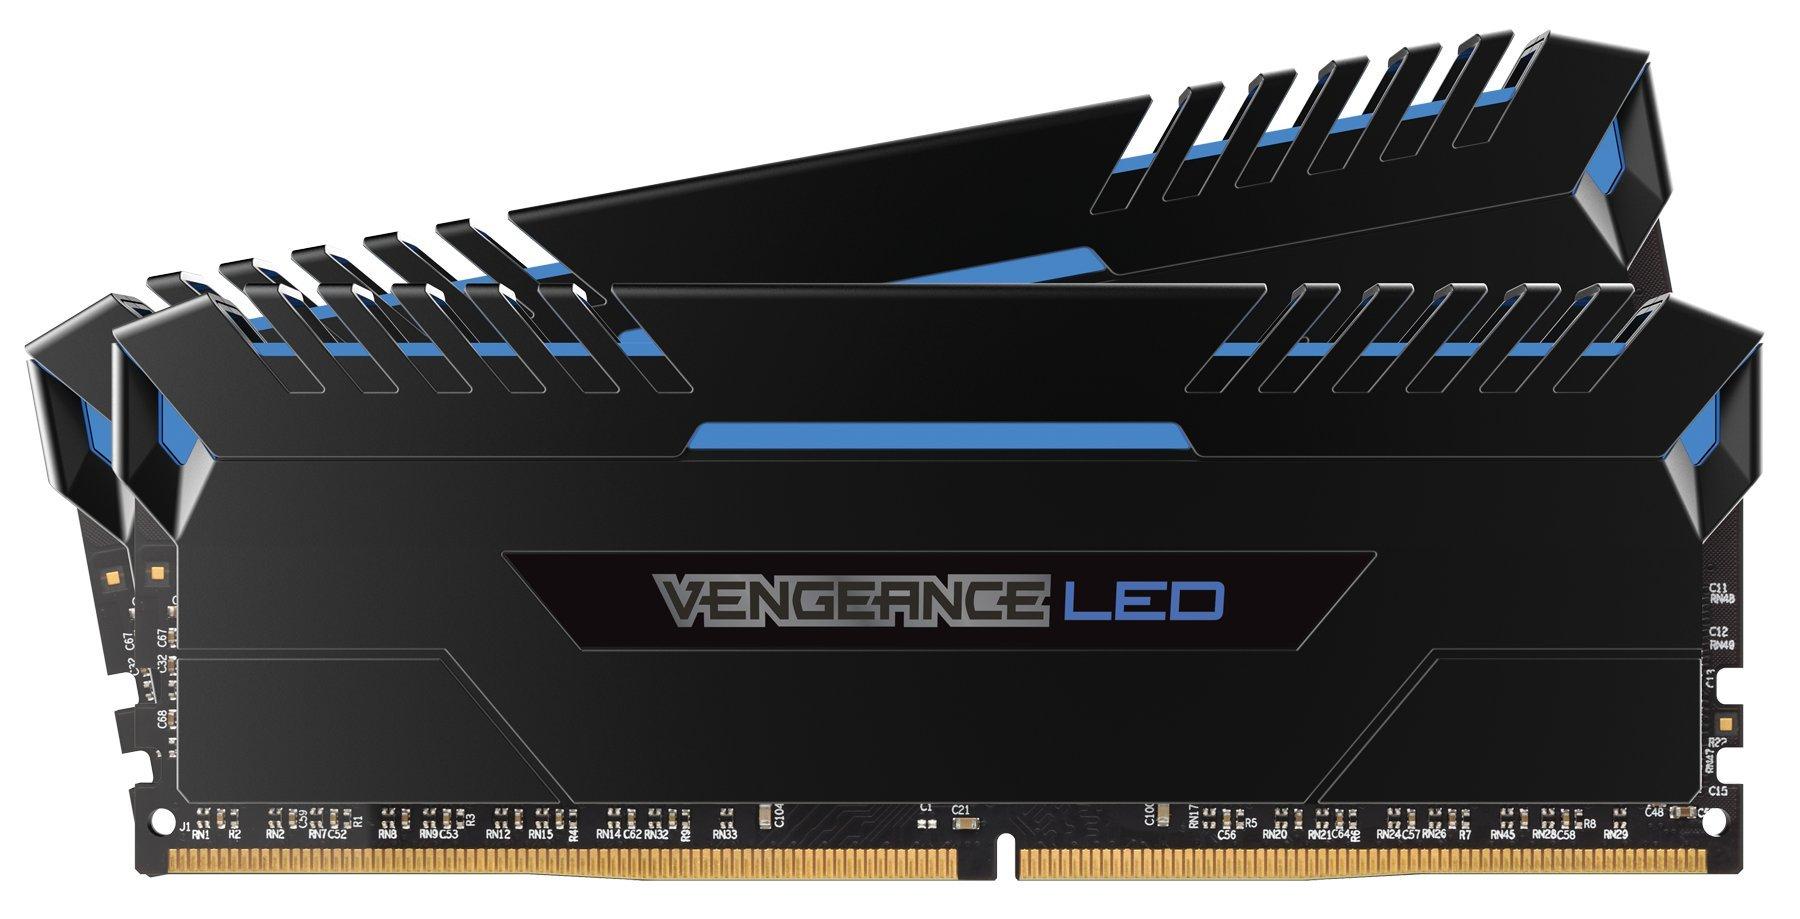 Corsair Vengeance LED 16GB (2x8GB) DDR4 3000 (PC4-24000) C15 for DDR4 Systems - Blue LED PC Memory (CMU16GX4M2C3000C15B)